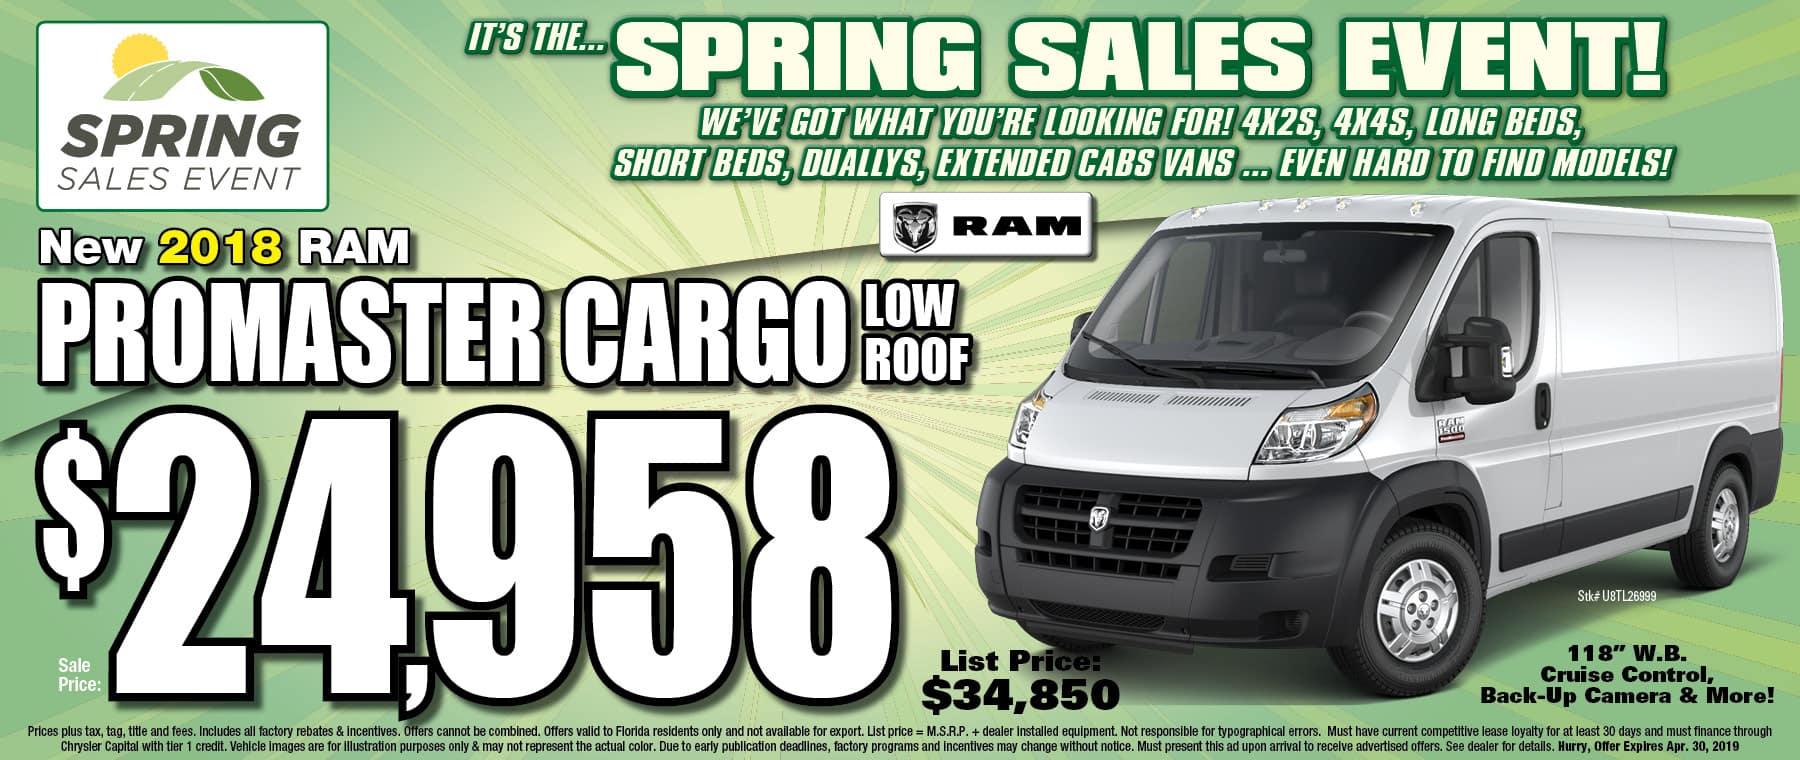 Ram Promaster Cargo! - Get Your Business Running at University Dodge RAM!